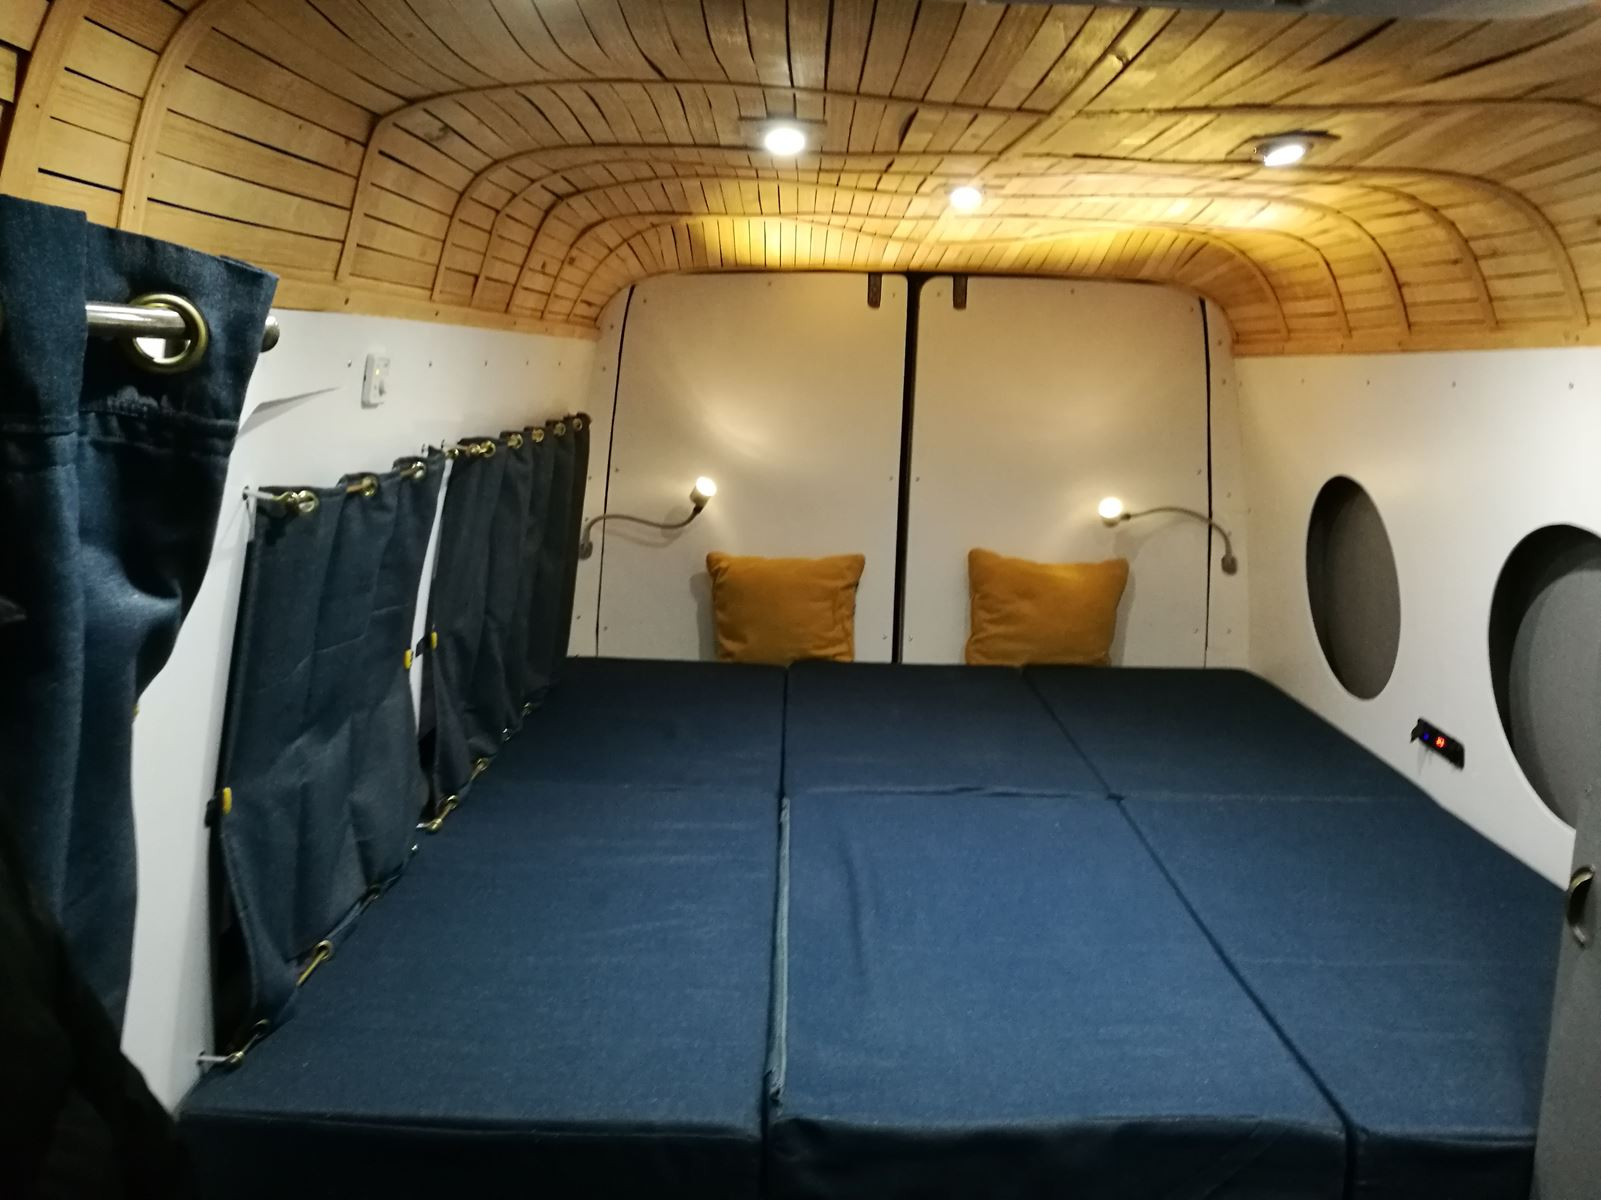 am nager son fourgon 7 le van migrateur. Black Bedroom Furniture Sets. Home Design Ideas